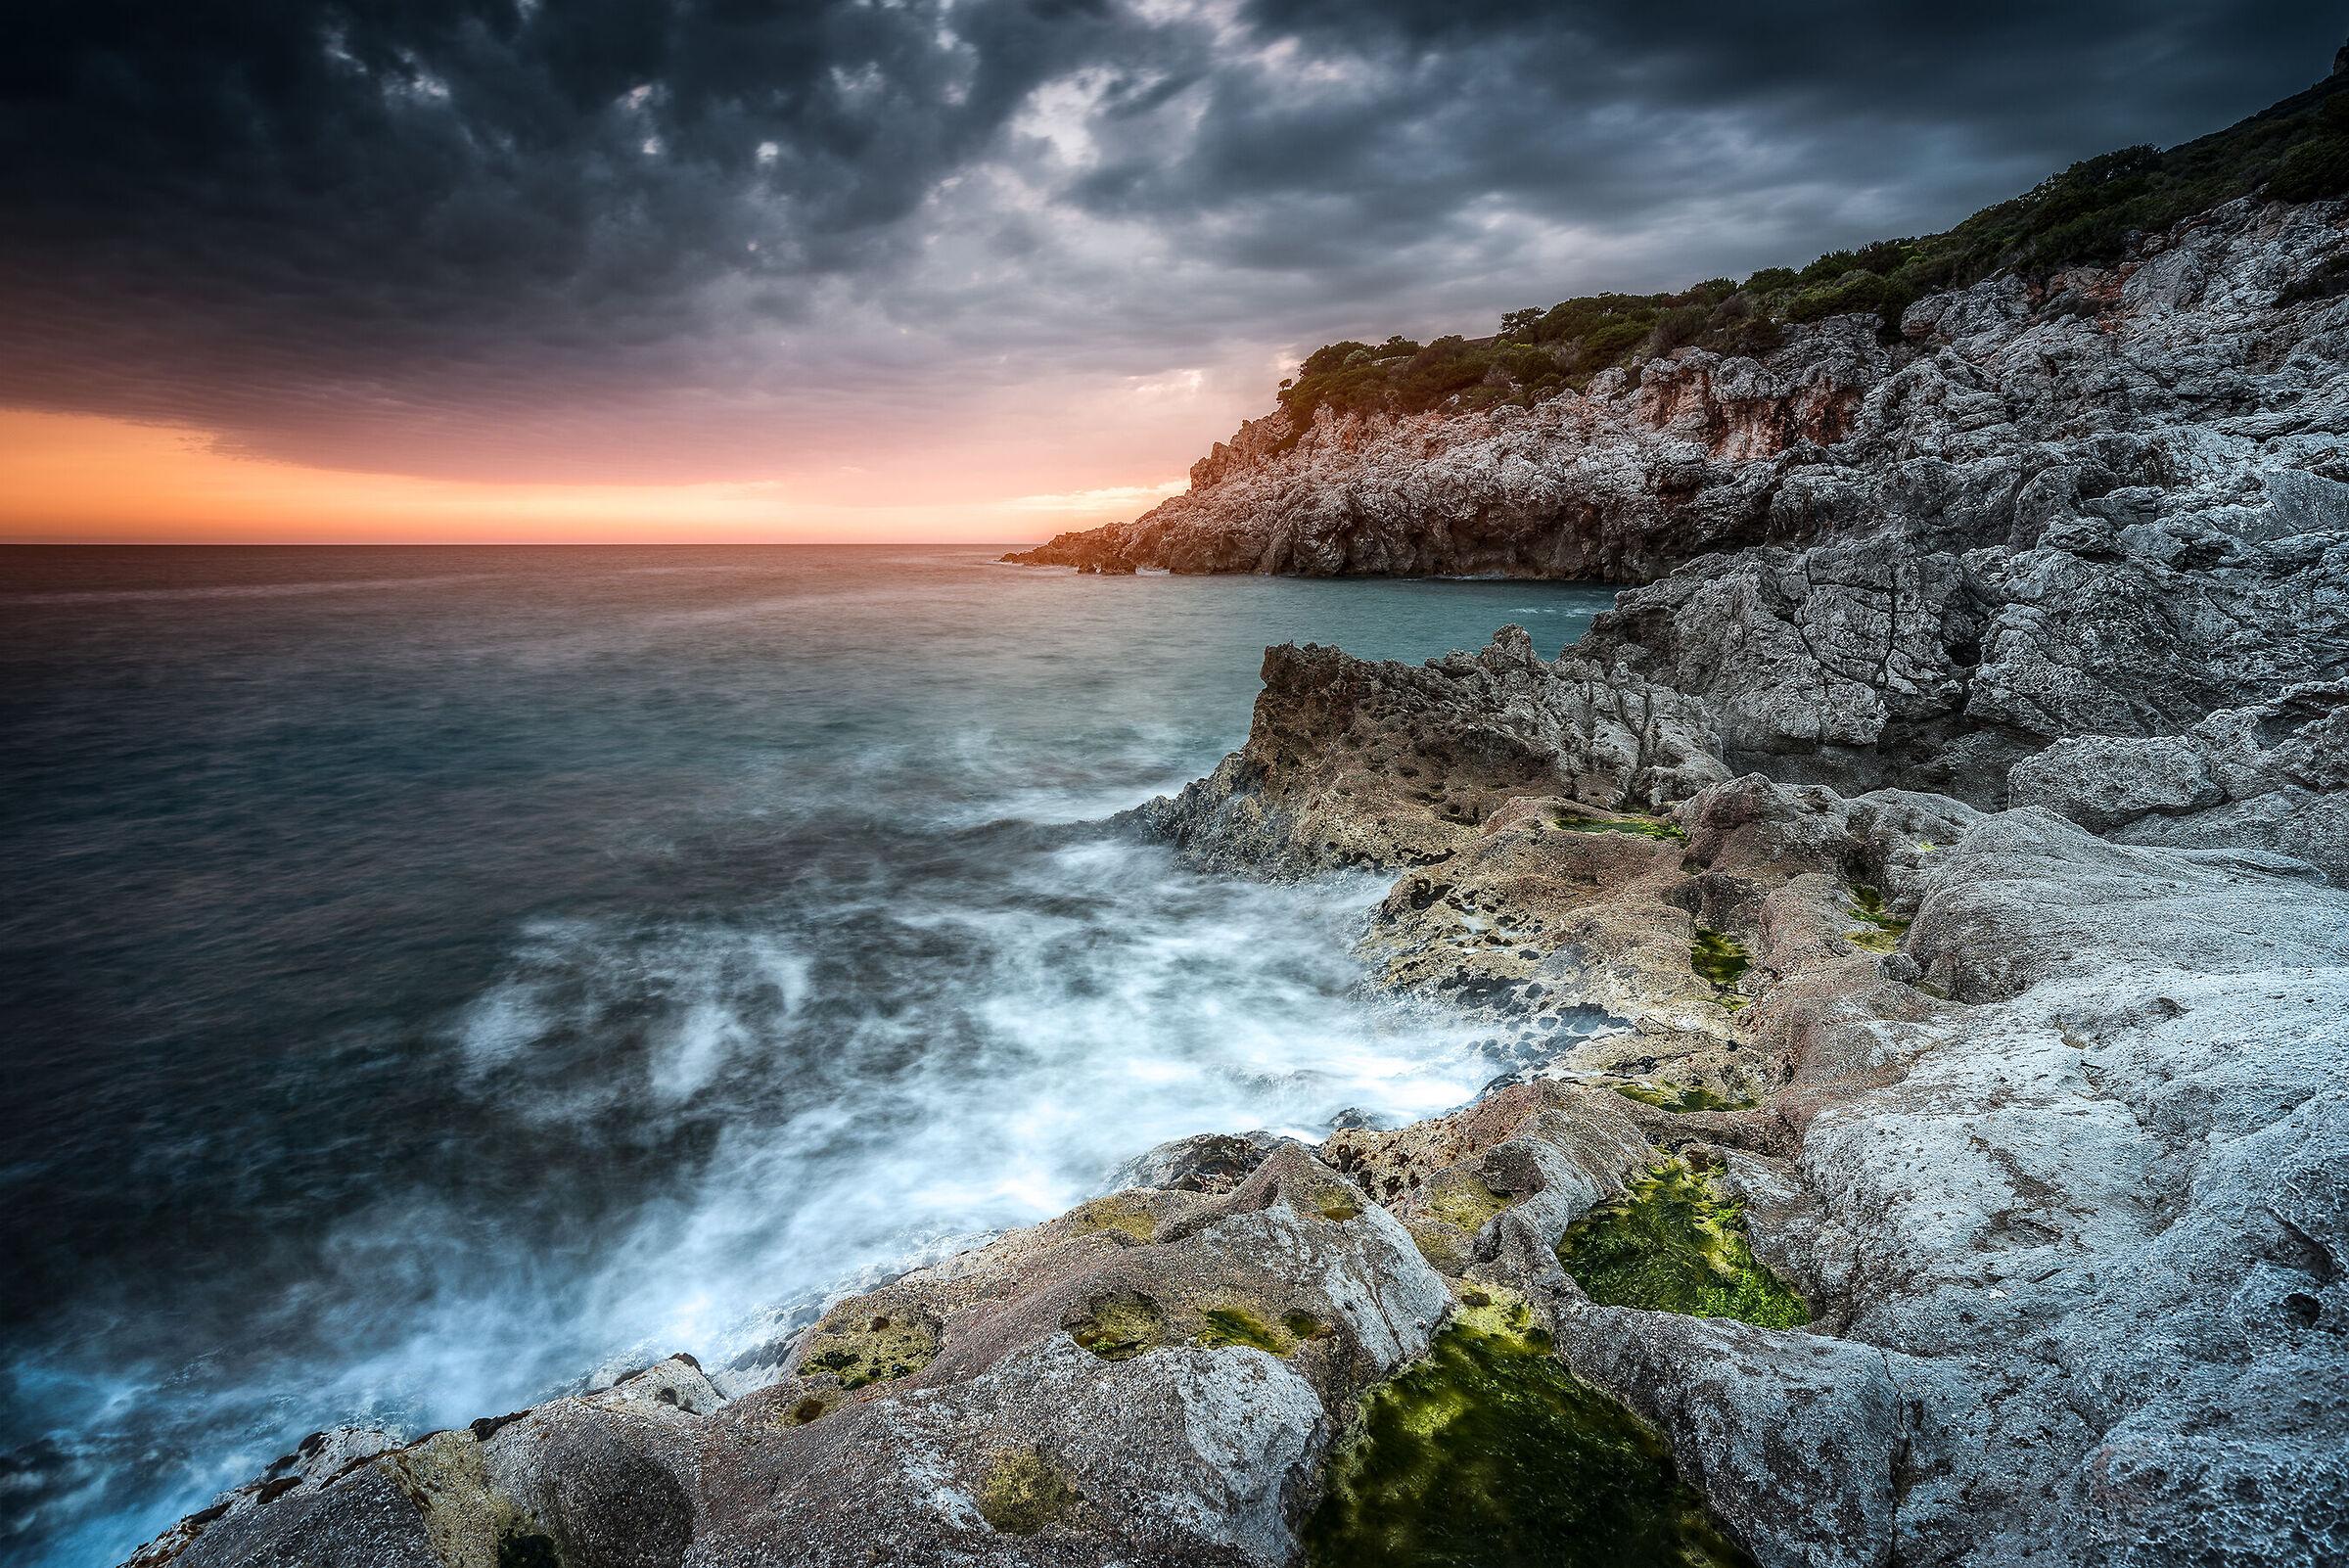 Sunset at Punta Rossa...